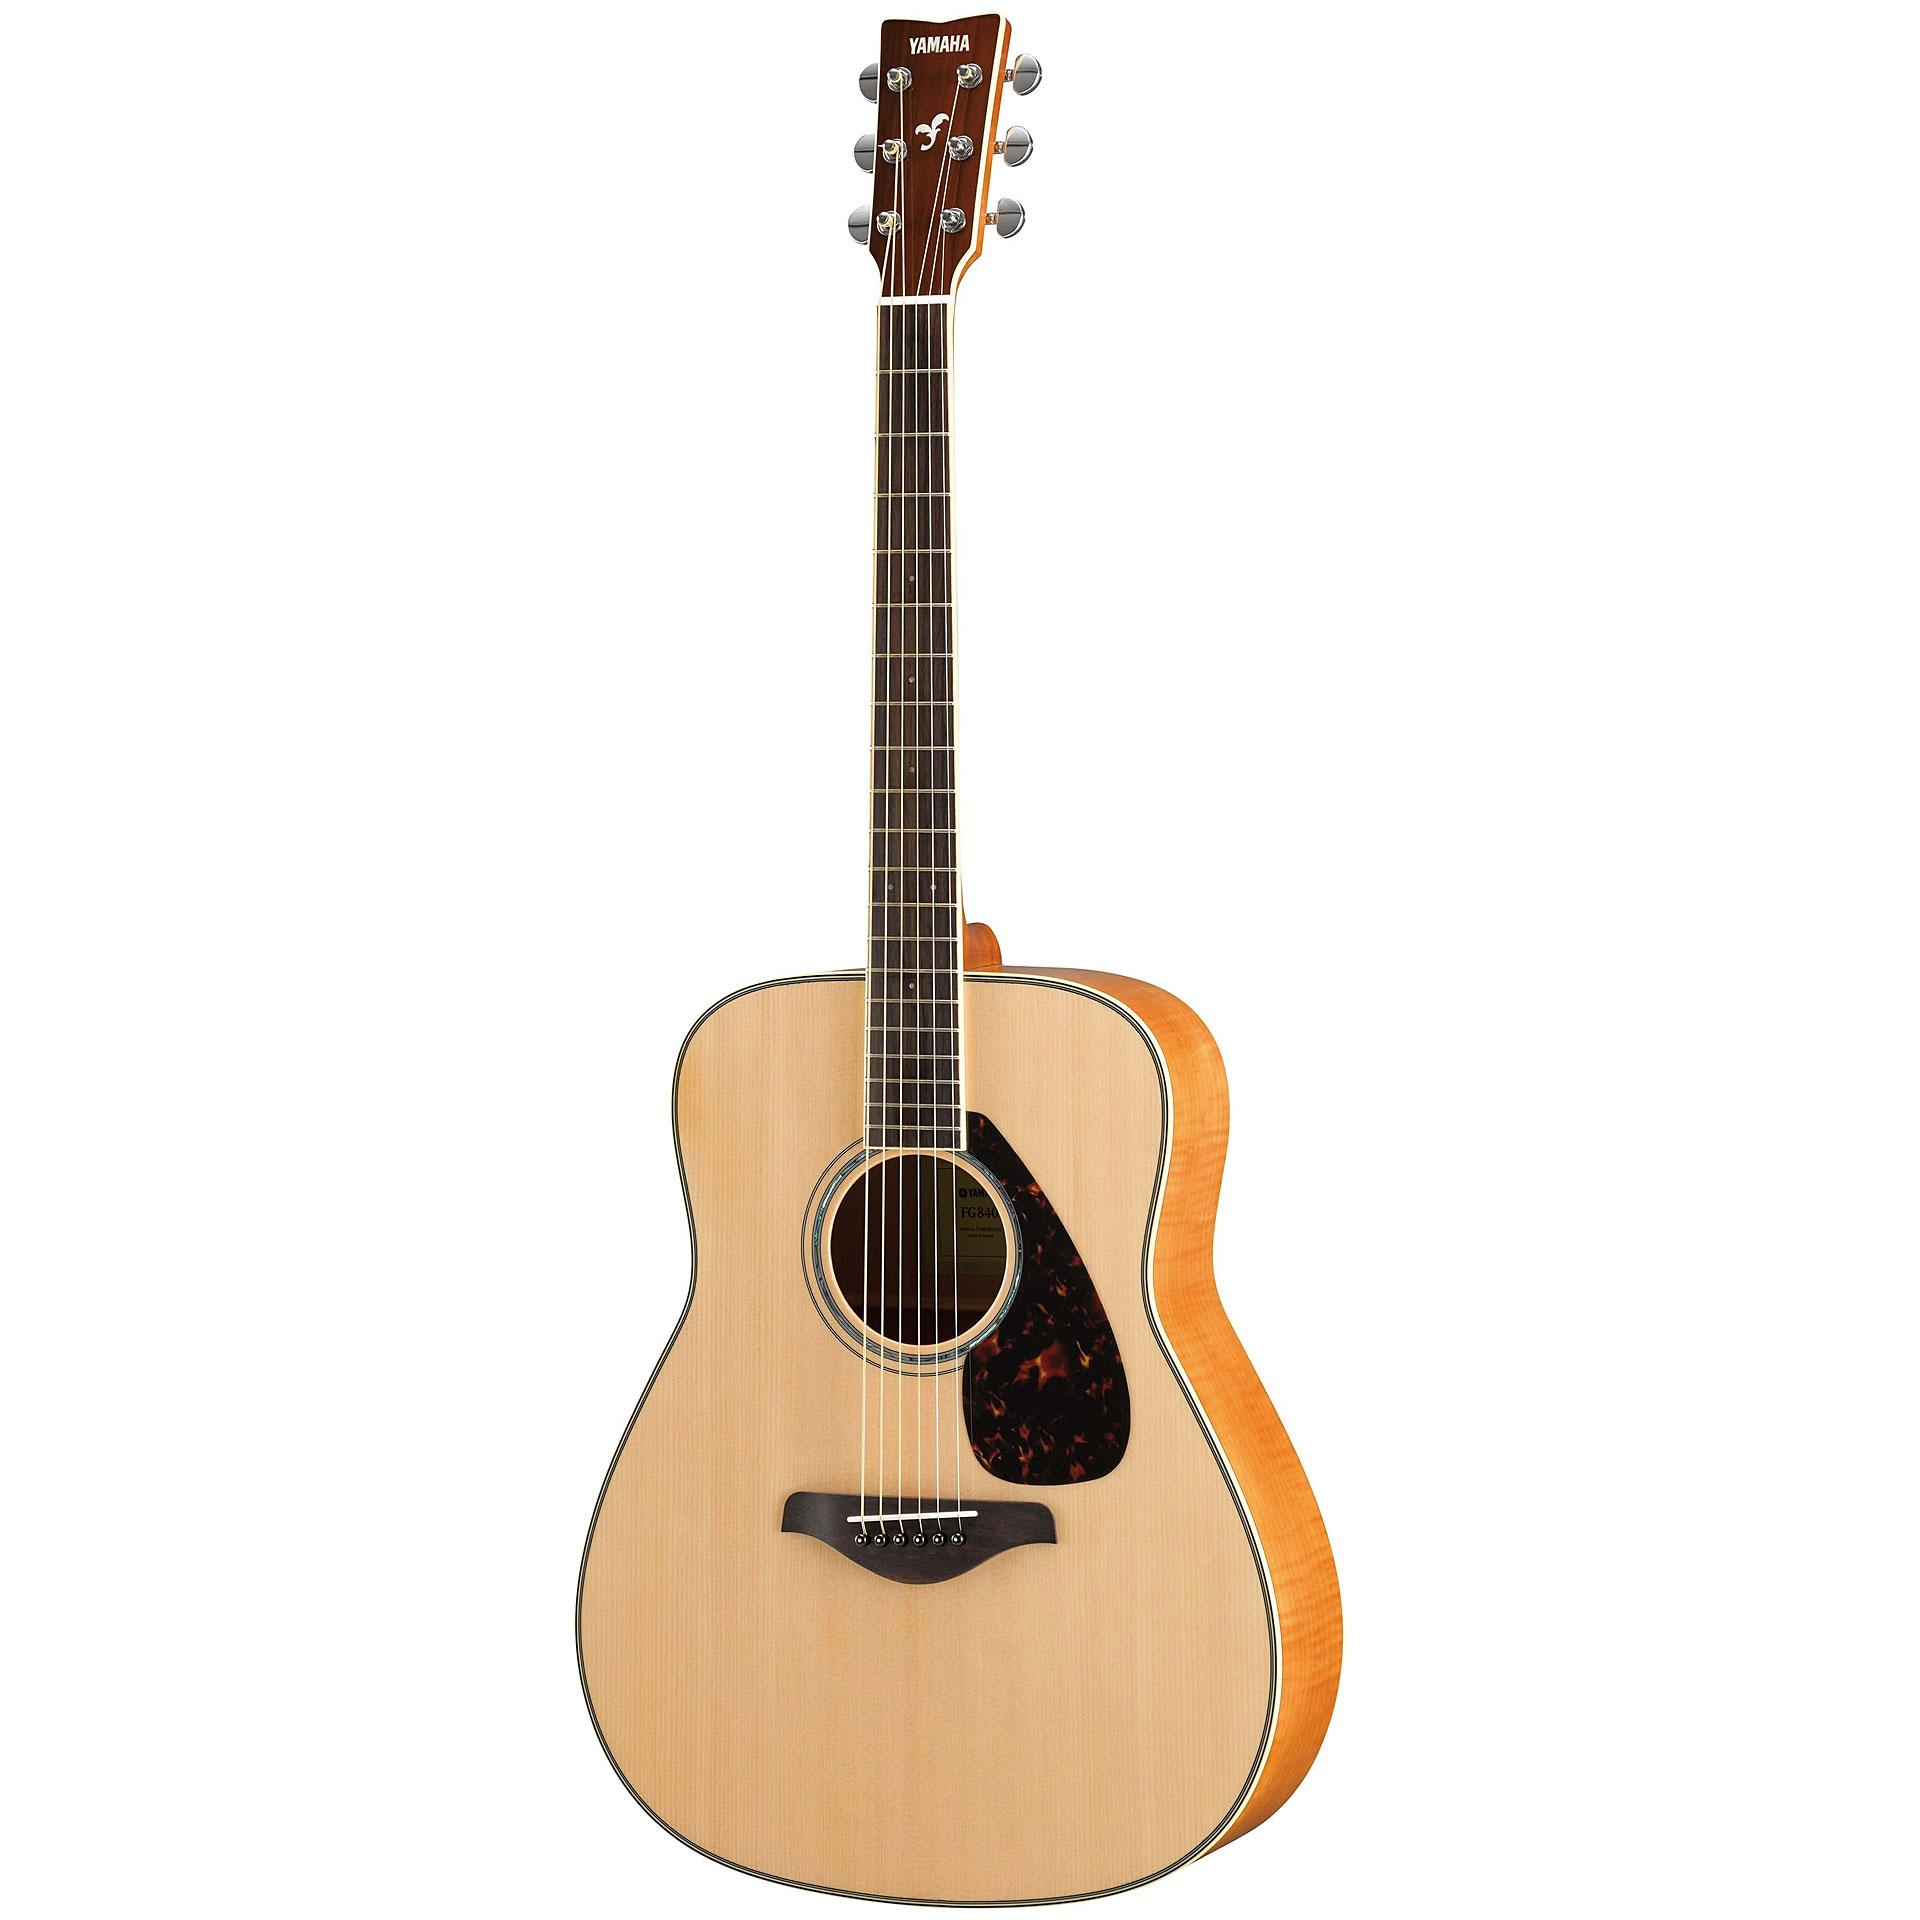 Yamaha Fgs Acoustic Guitar